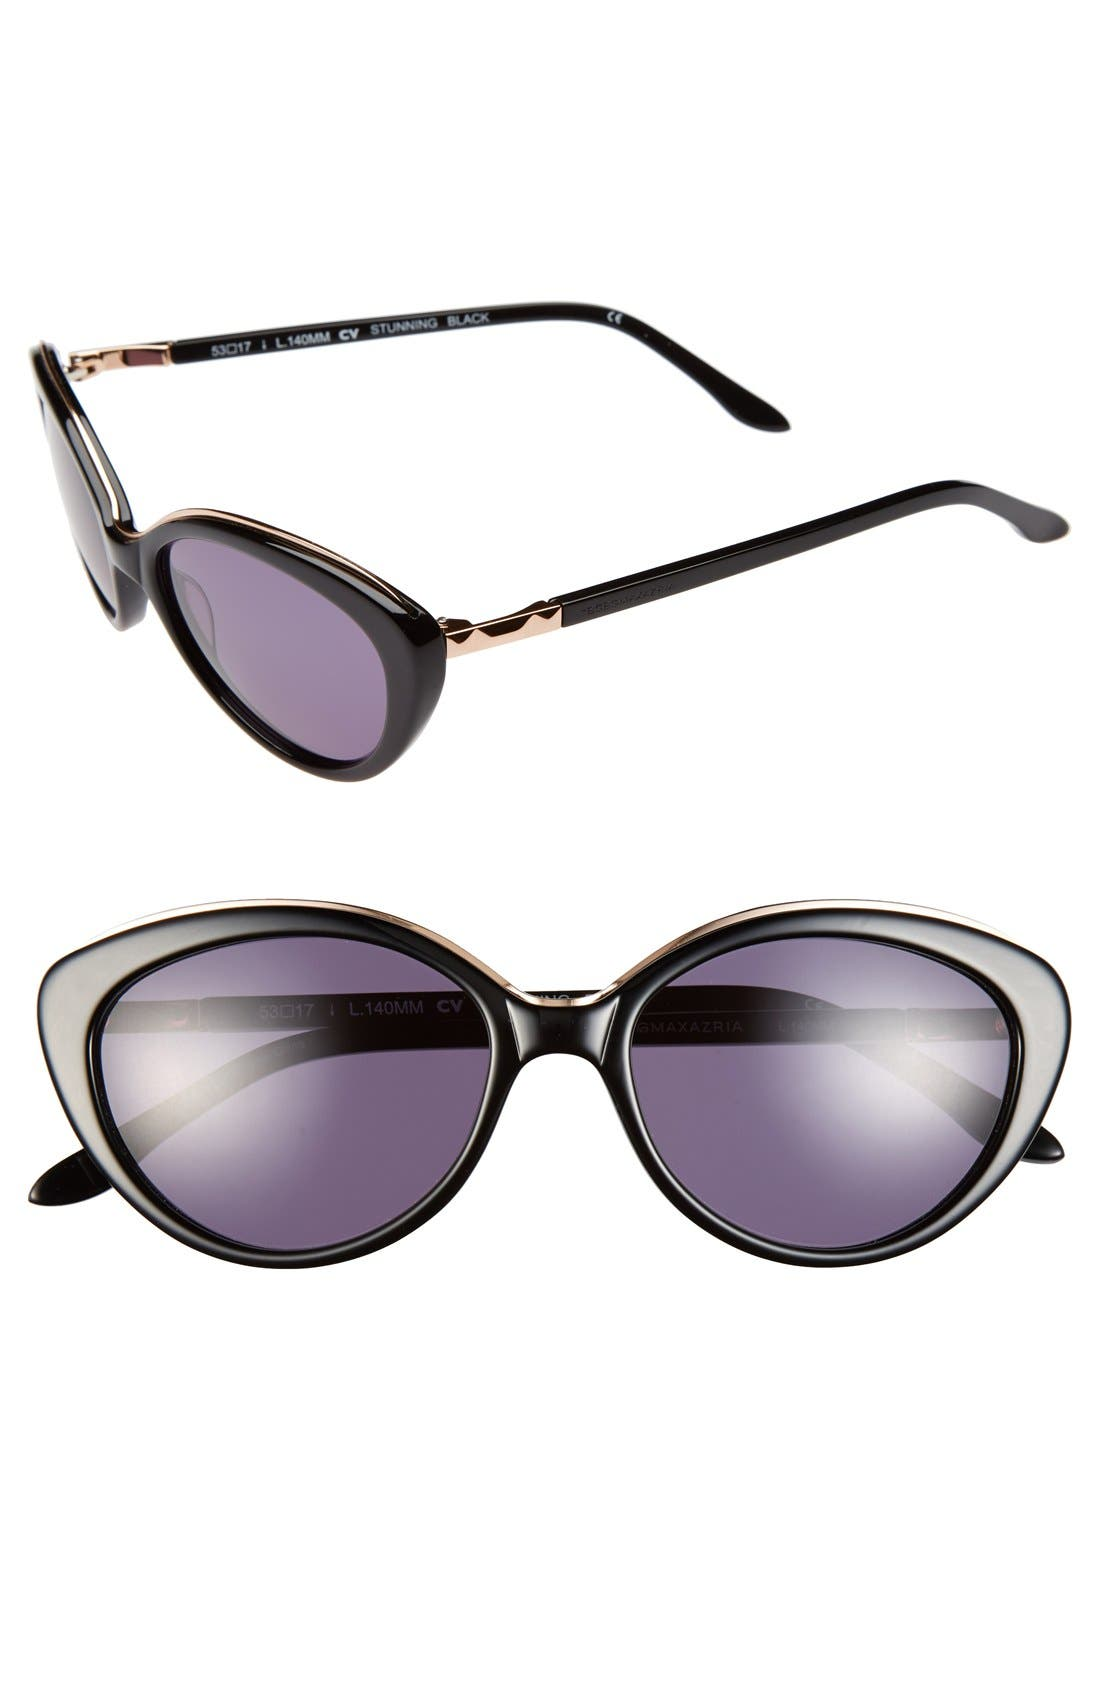 Alternate Image 1 Selected - BCBGMAXAZRIA 'Stunning' 53mm Cat Eye Sunglasses